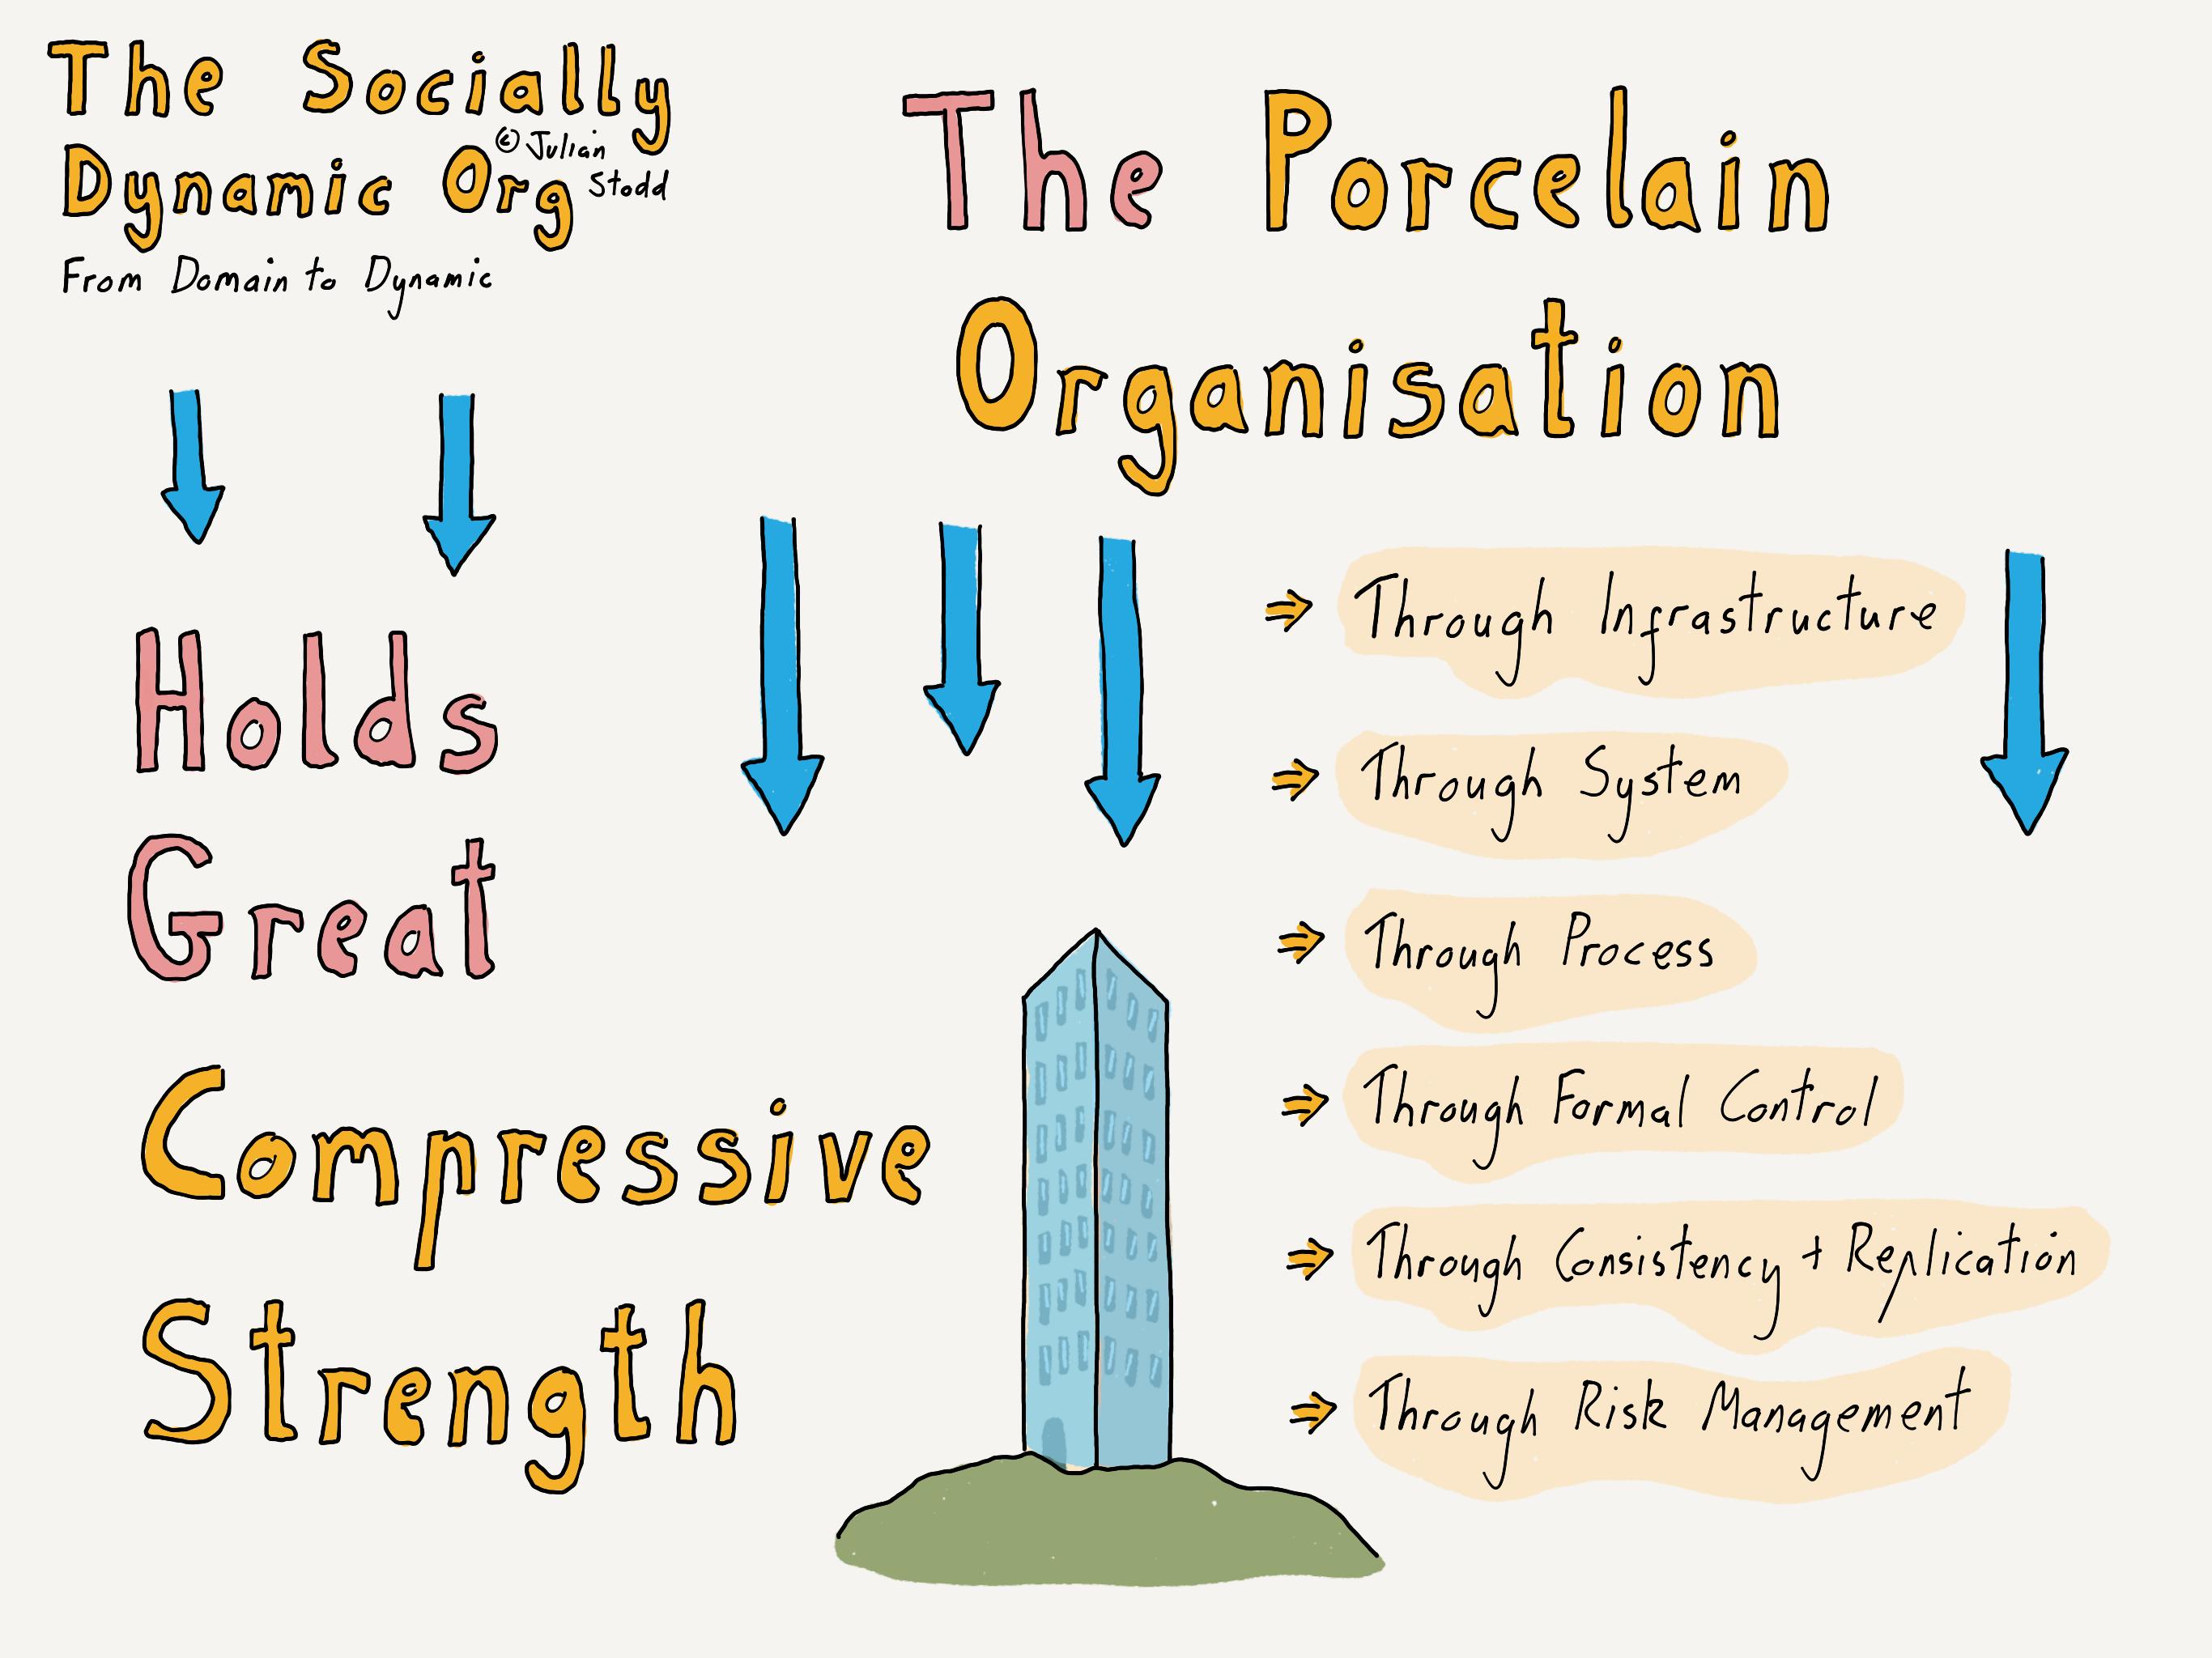 The Porcelain Organisation [Domain to Dynamic Pt 6]  Julian